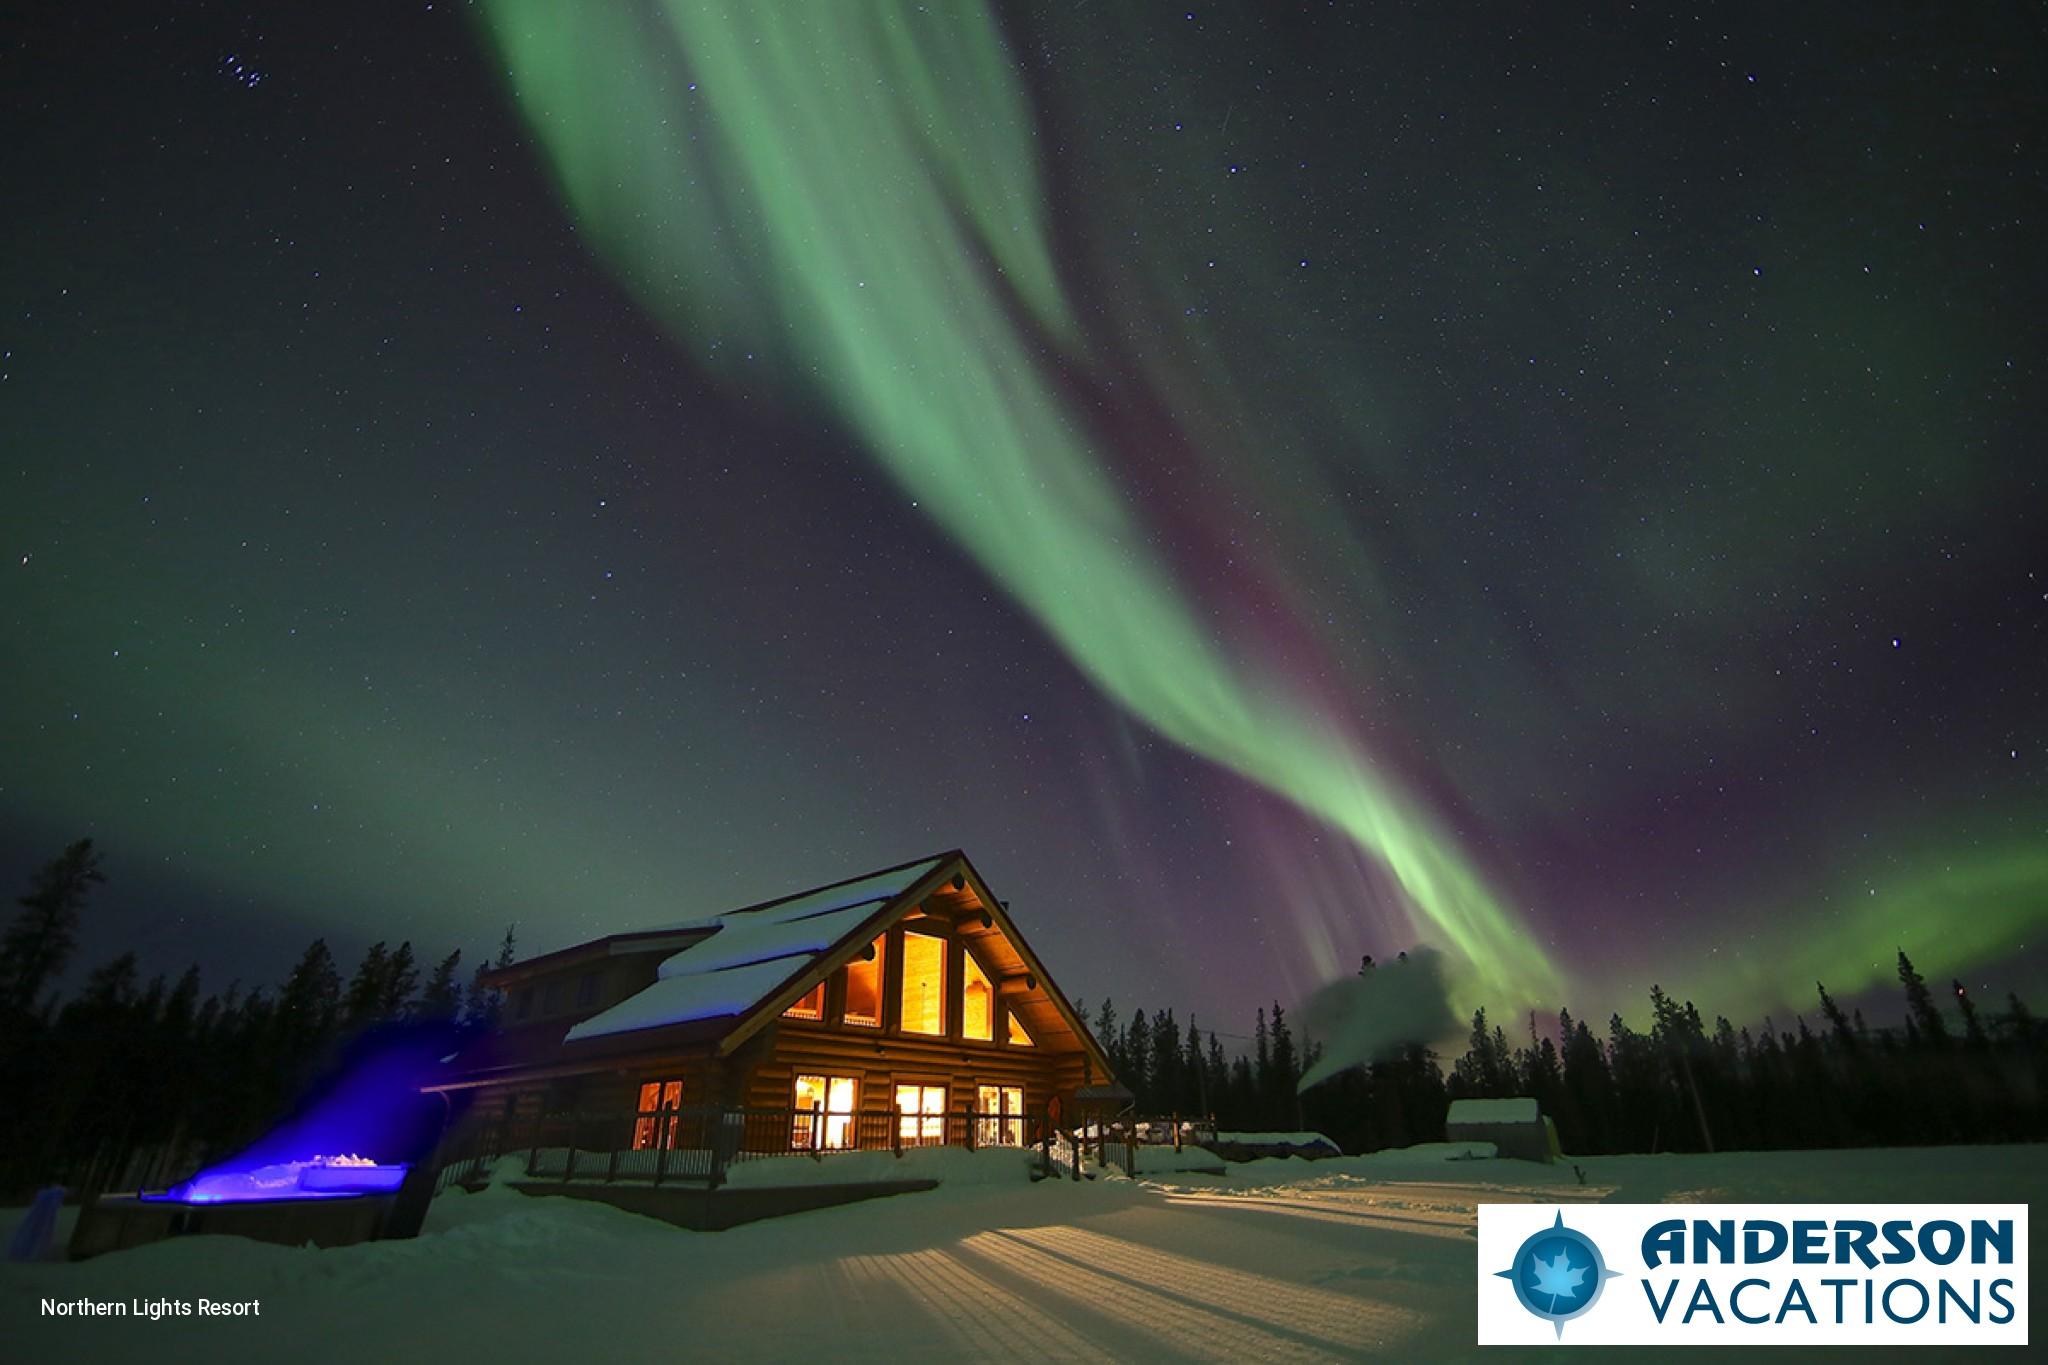 Northern Lights Resort